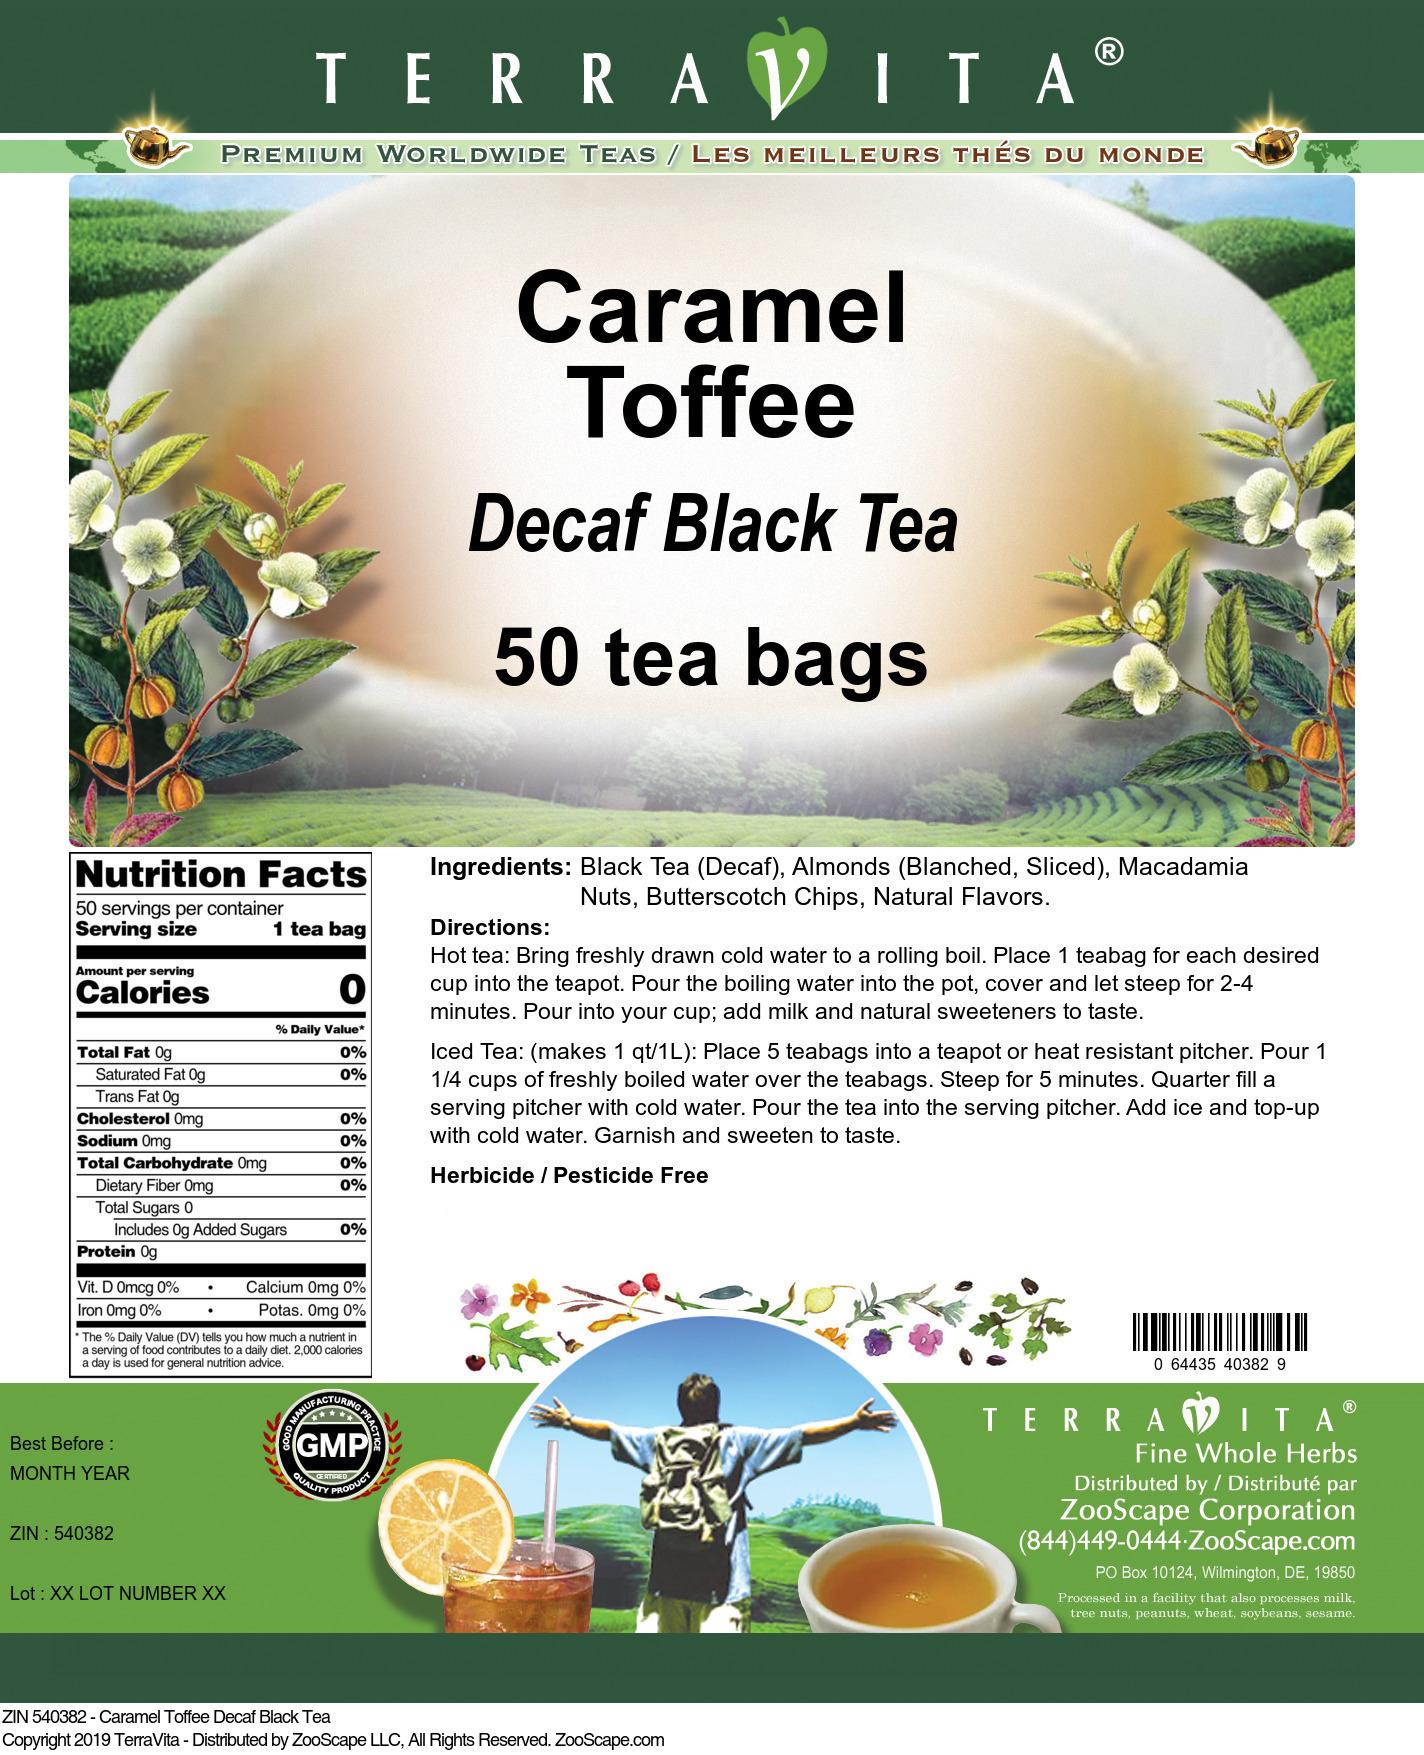 Caramel Toffee Decaf Black Tea